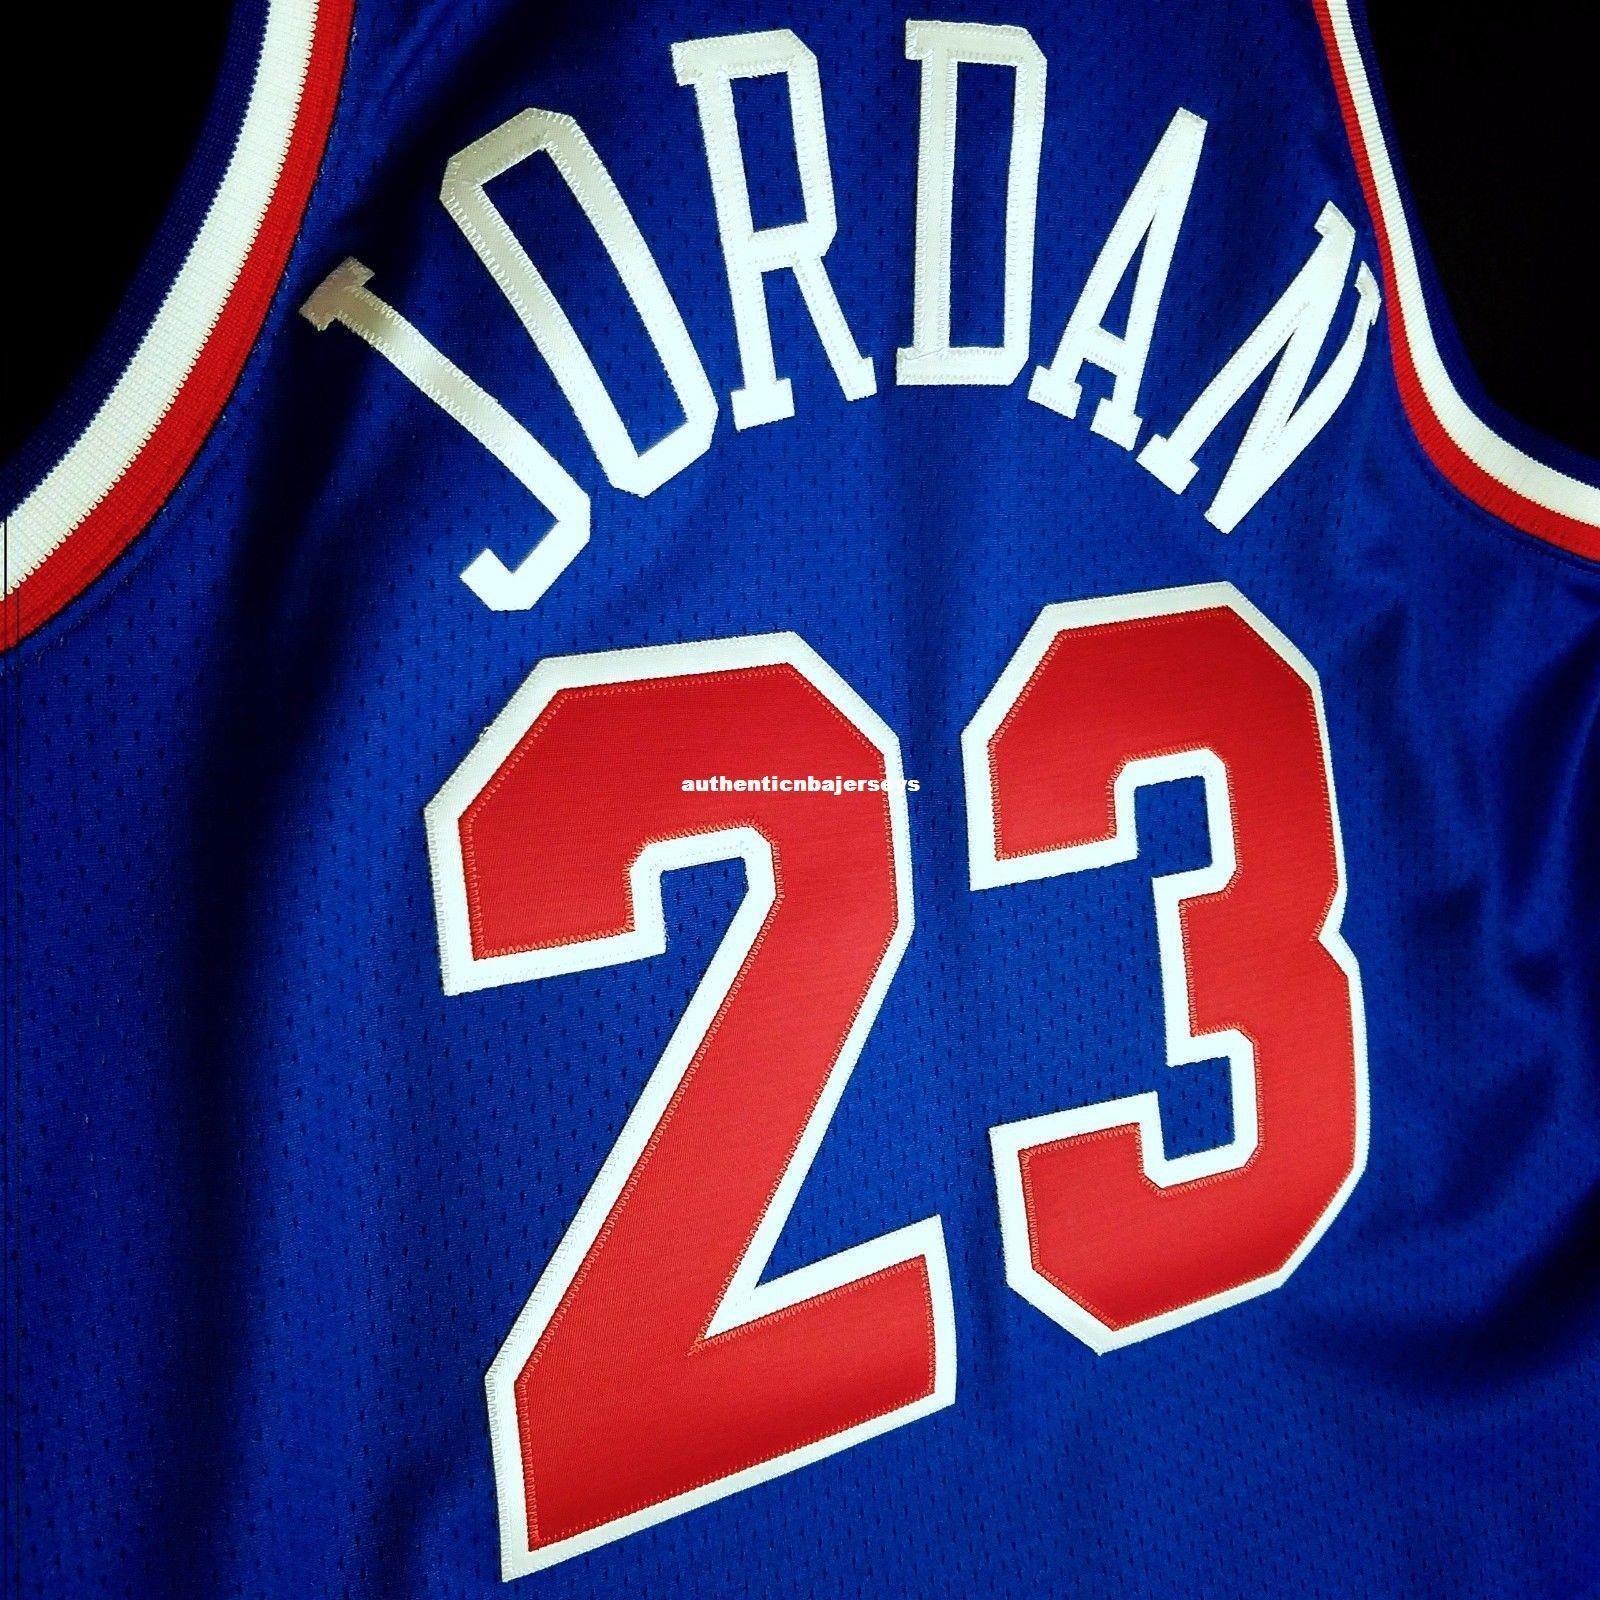 100% cosido Michael # 23 Mitchell Ness 1993 Tamaño azul Jersey Hombres Chaleco XS-6XL cosido jerseys de baloncesto NCAA